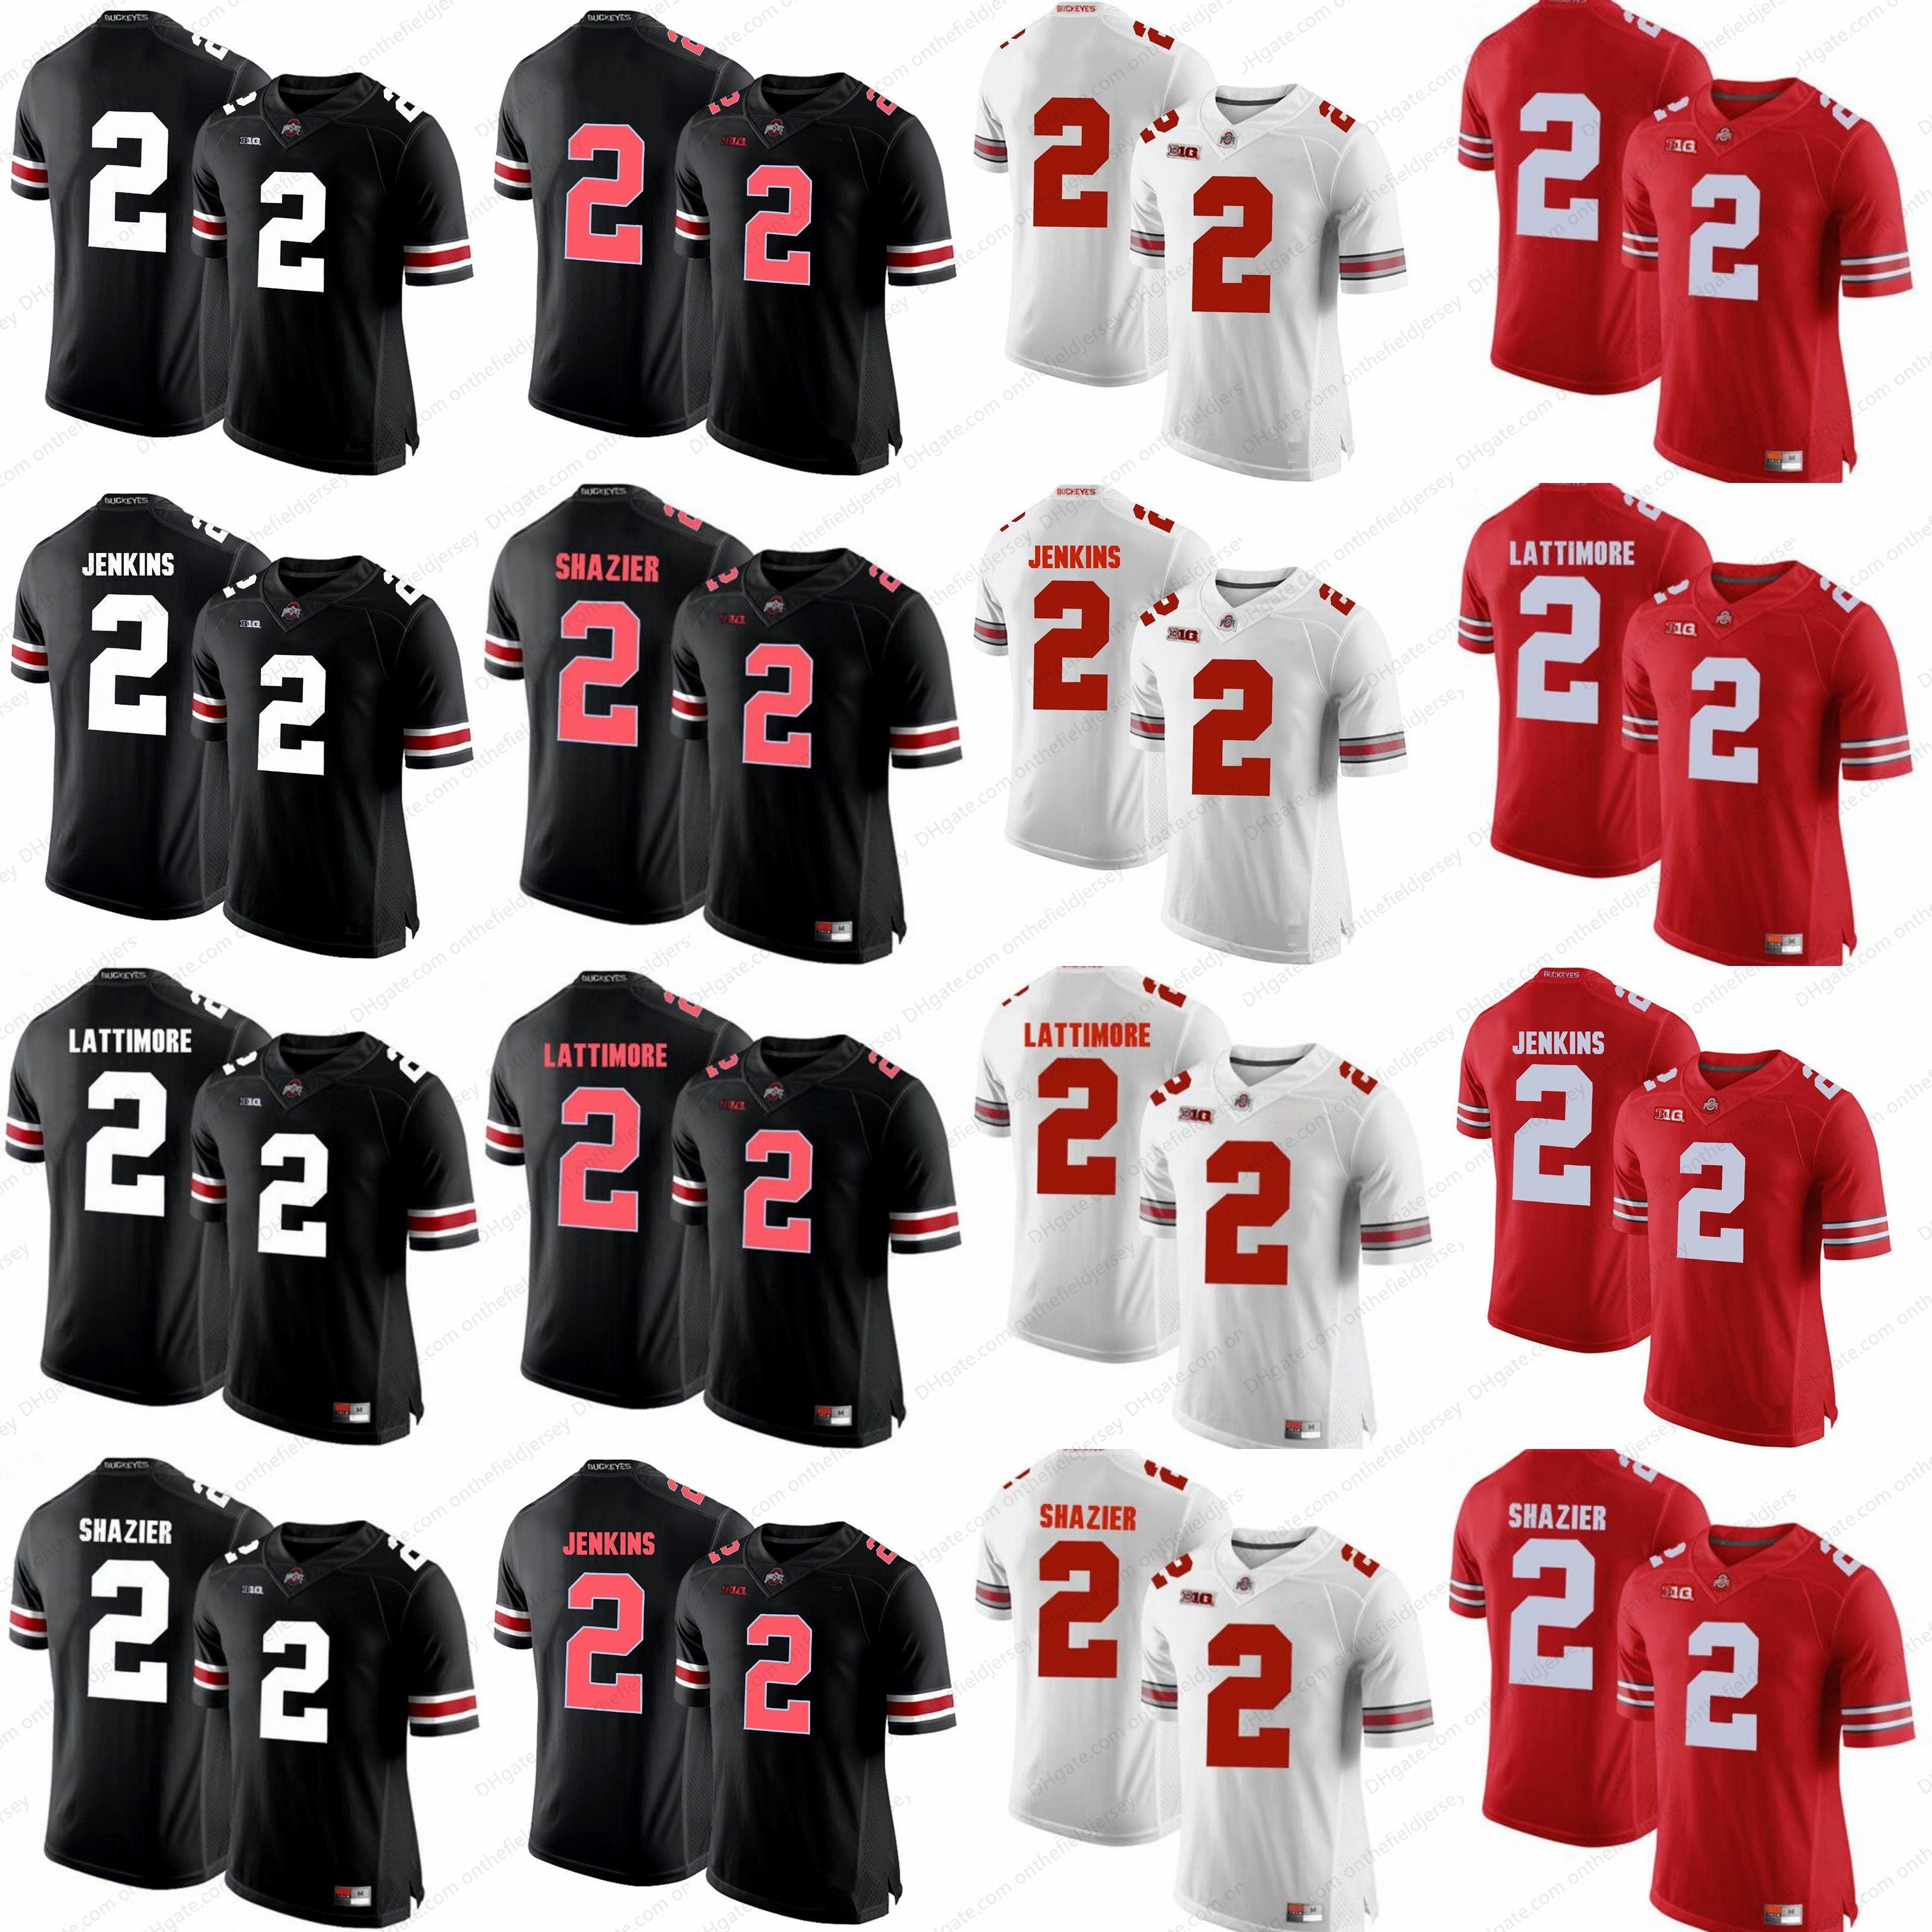 best sneakers 447c7 8425d 2018 Ncaa Ohio State Buckeyes #2 Ryan Shazier #2 Malcolm Jenkins 2 Marshon  Lattimore 2 Cris Carter 2 Terrelle Pryor College Football Jersey S 3xl From  ...